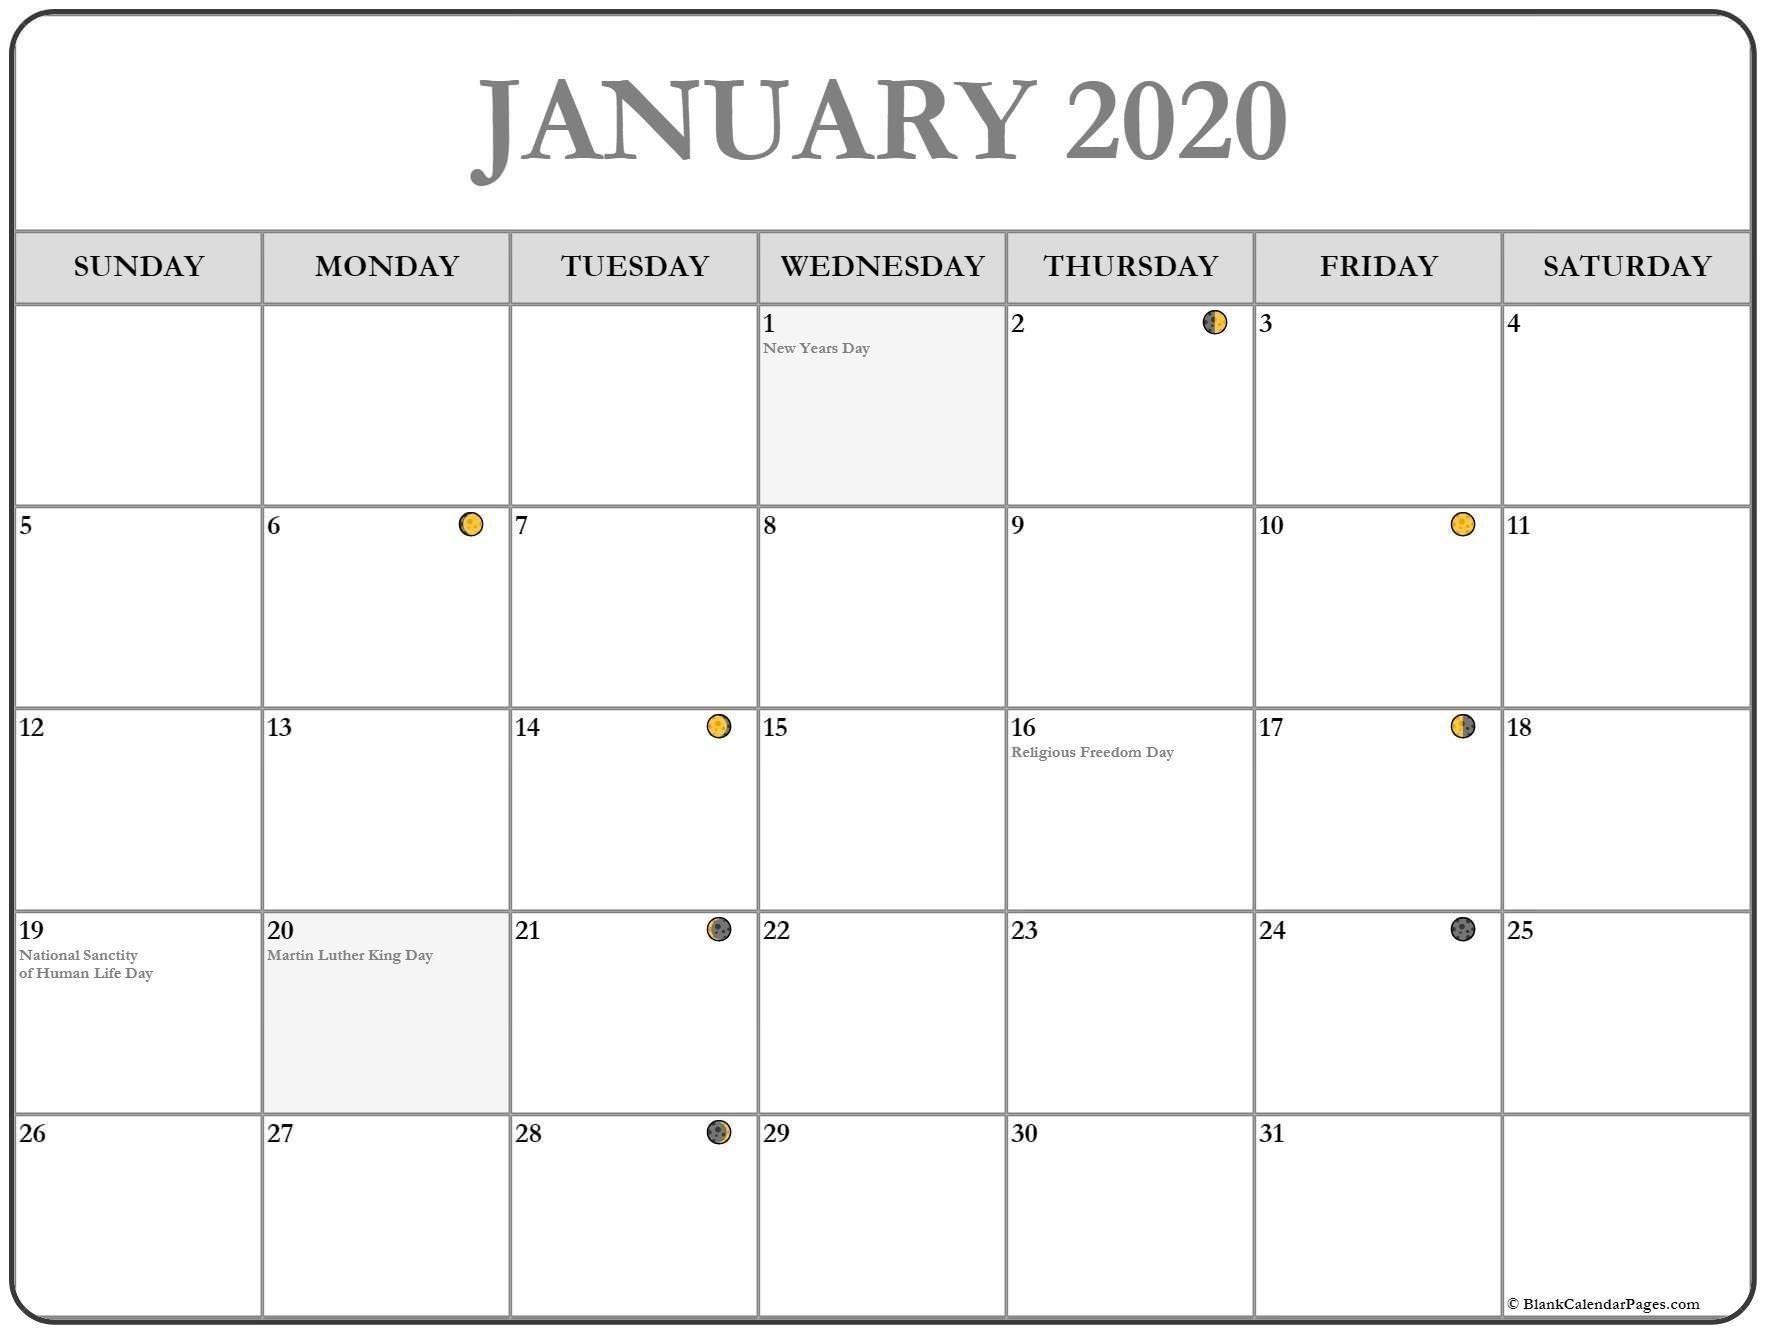 August 2019 Calendar Philippines | Calendar Template-January 2020 Calendar Philippines